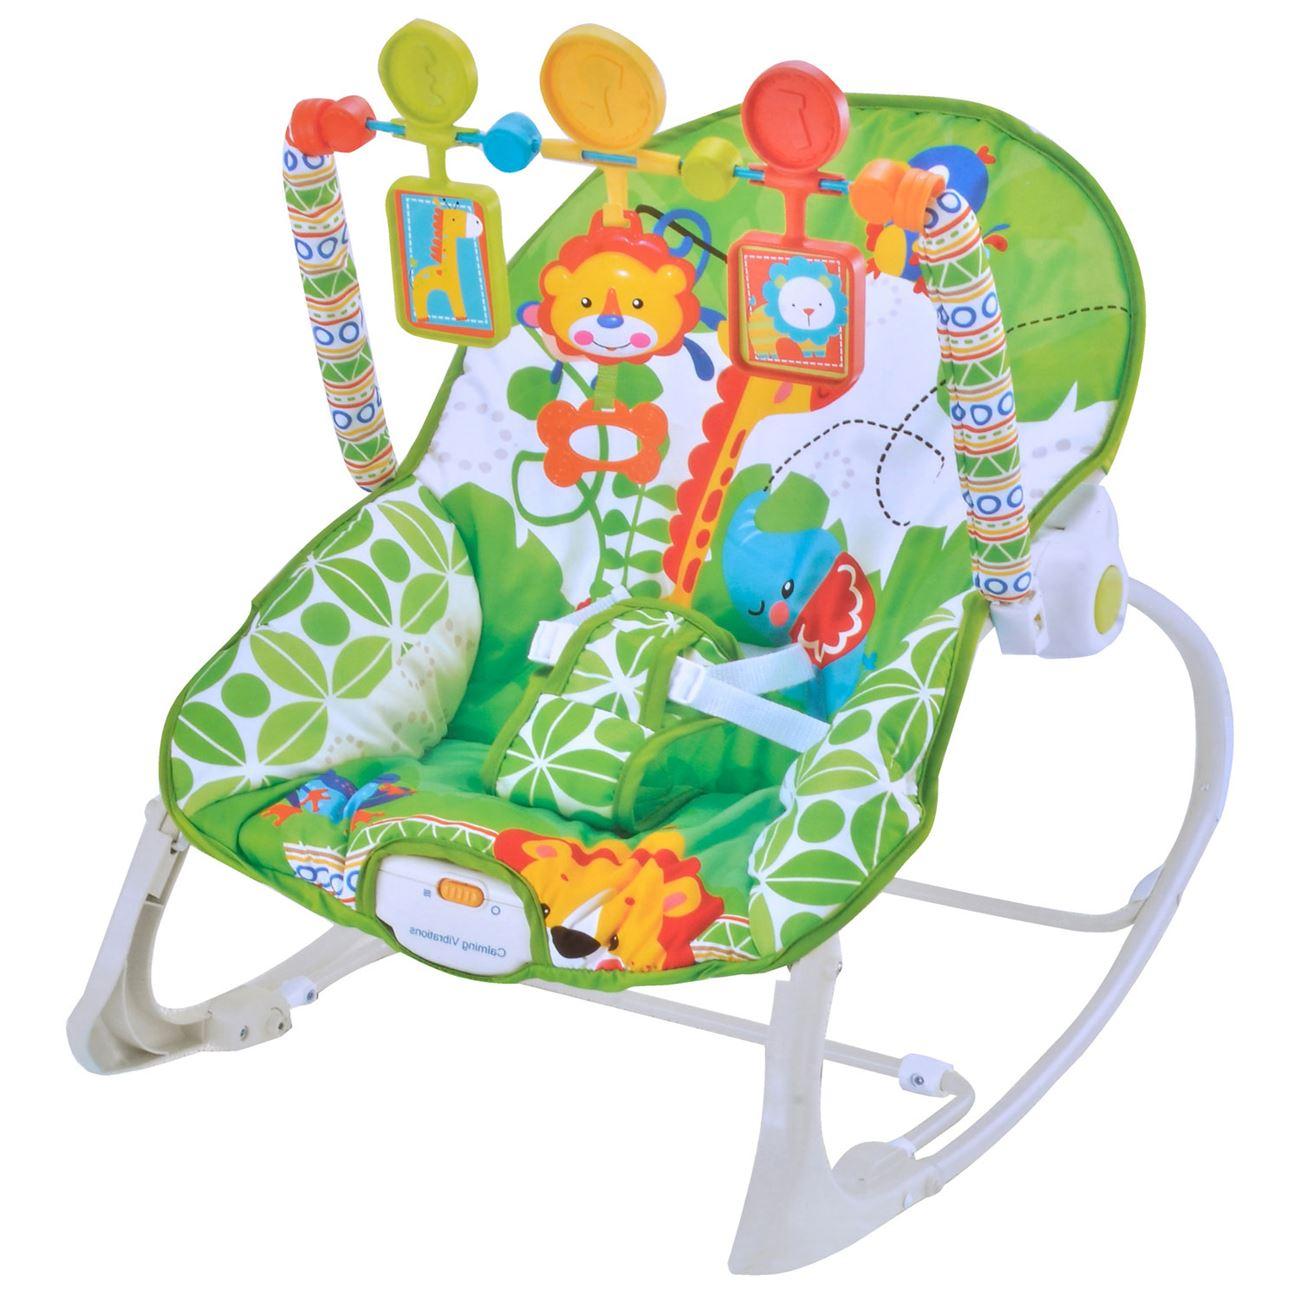 bfcef72f400 Στράτες-Ρελαξ-Απασχόληση Μωρού < Βρεφικά Είδη   Jumbo